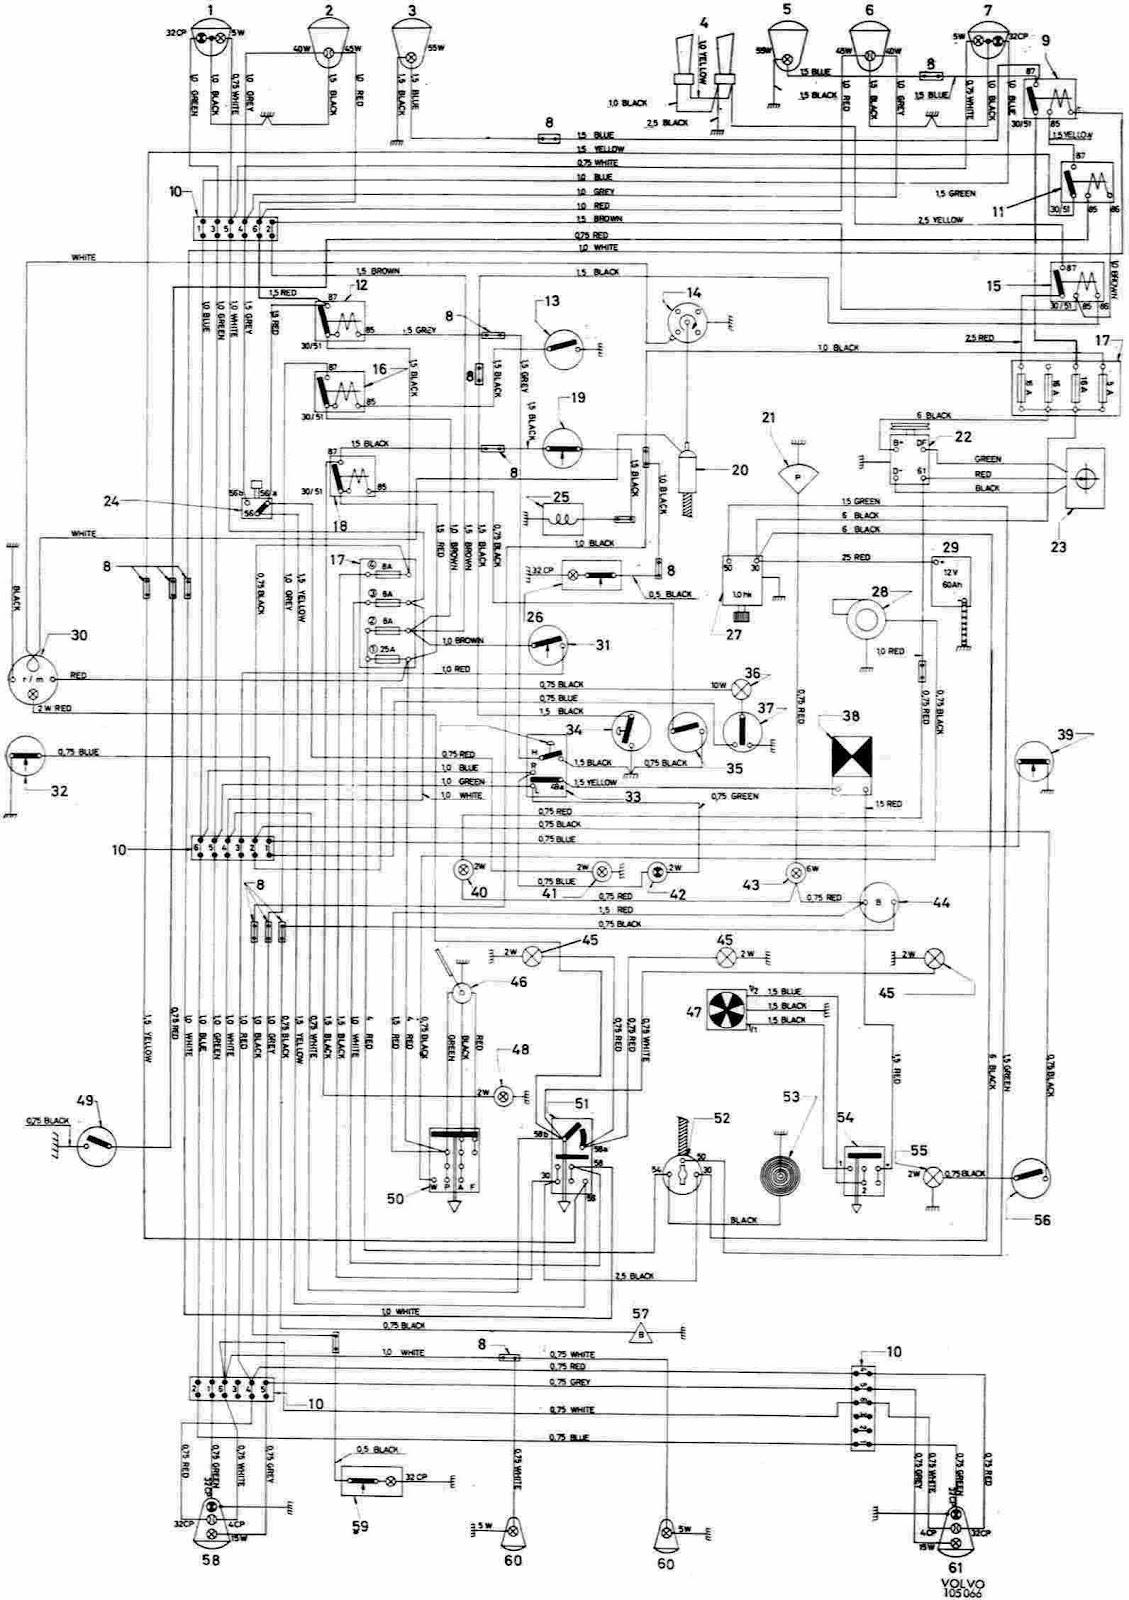 1998 volvo truck wiring diagram | relate-concepti wiring diagram number -  relate-concepti.garbobar.it  garbo bar